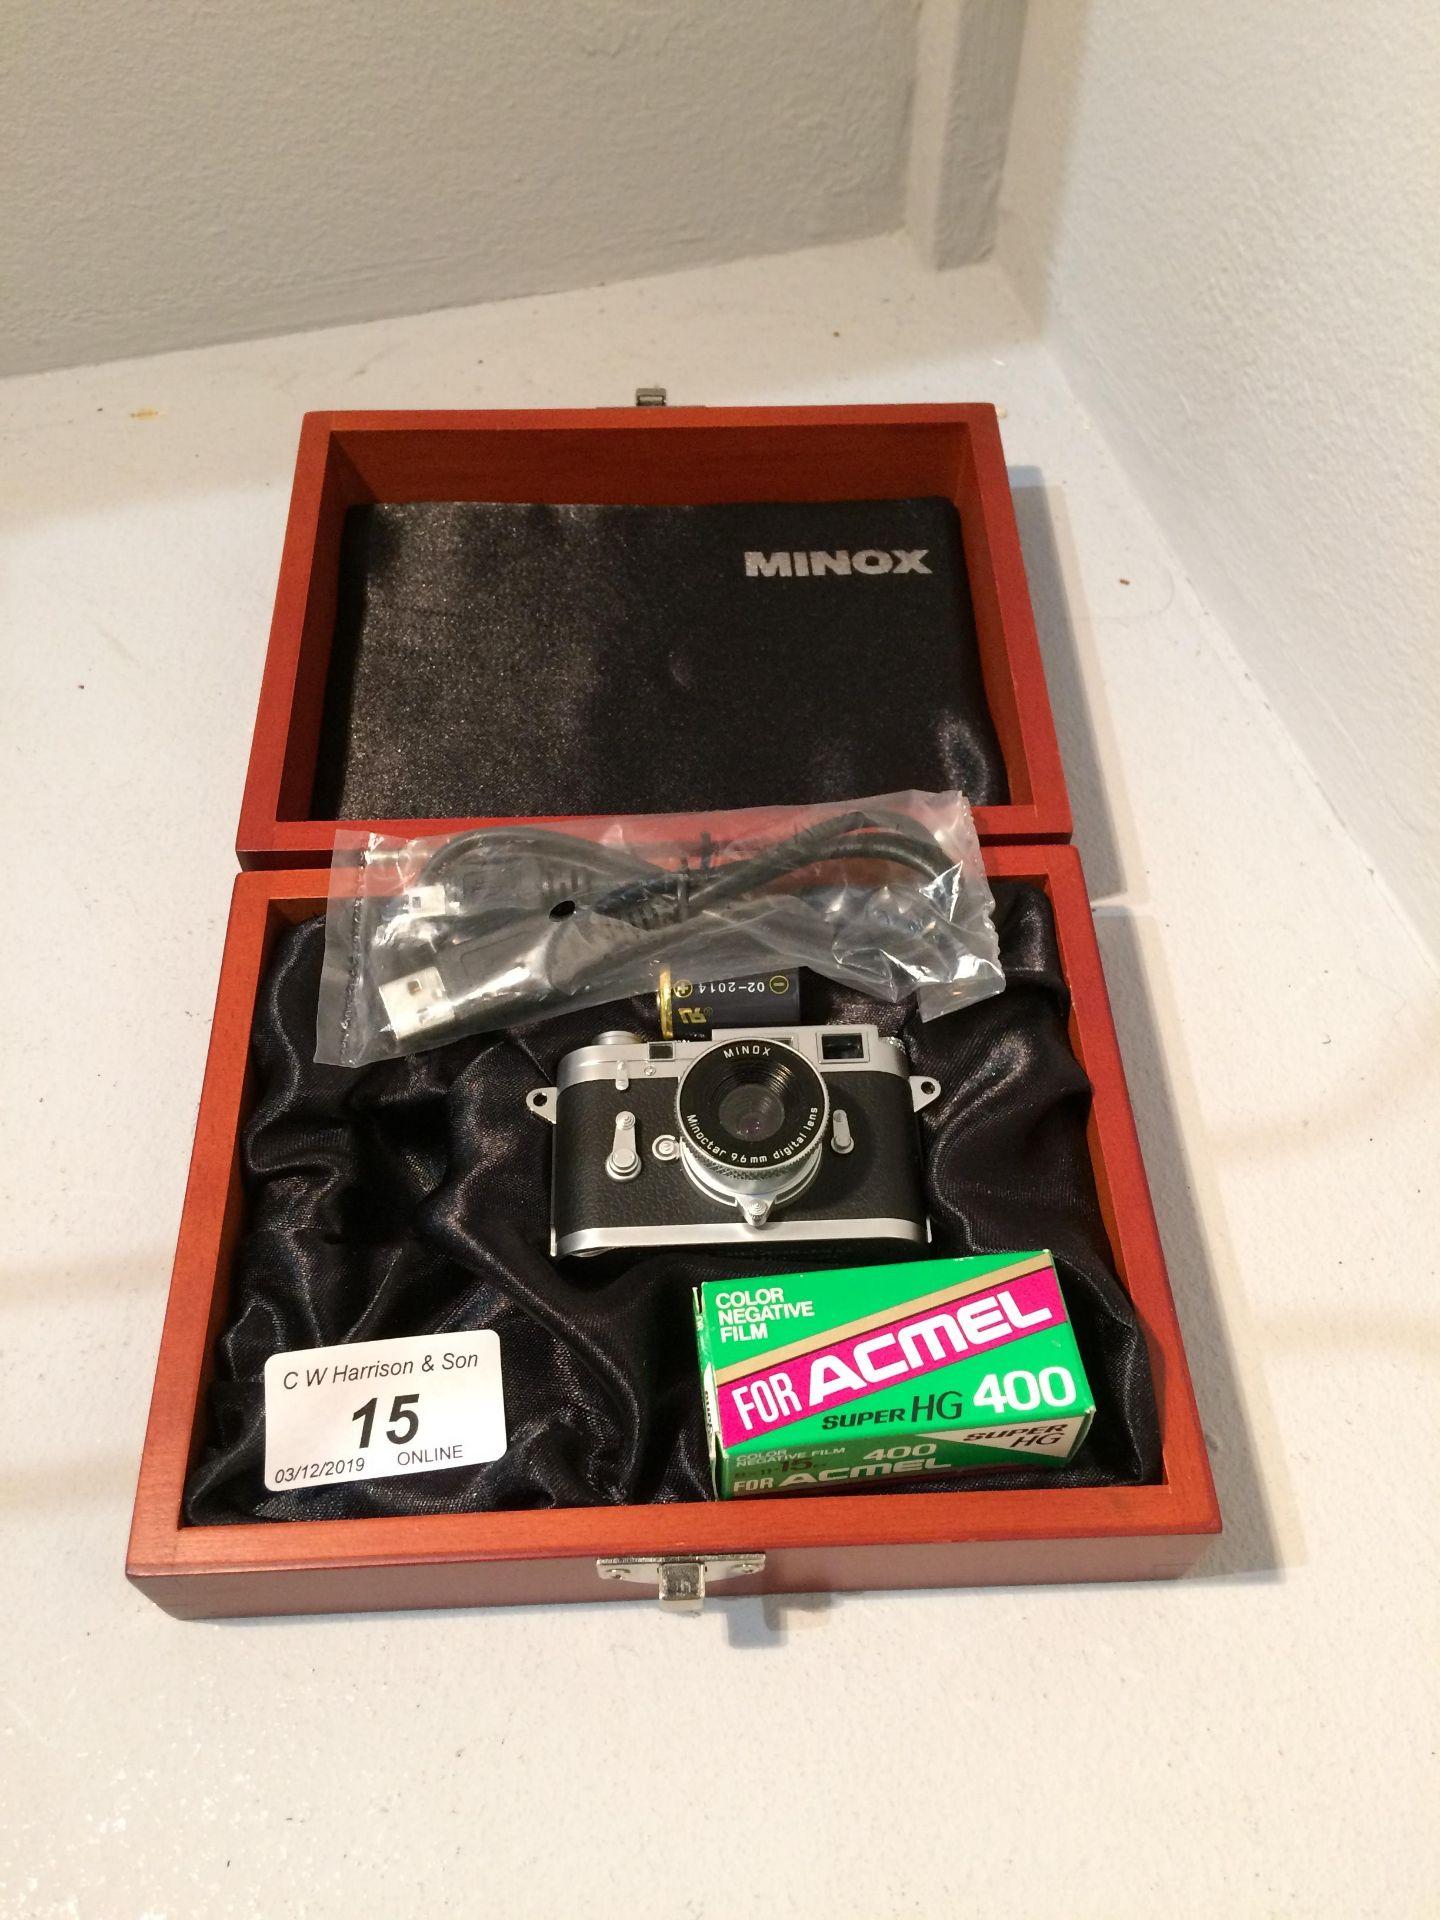 Lot 15 - Minox Camera Collections miniature Leica 8120099 camera, Minoctar 9.